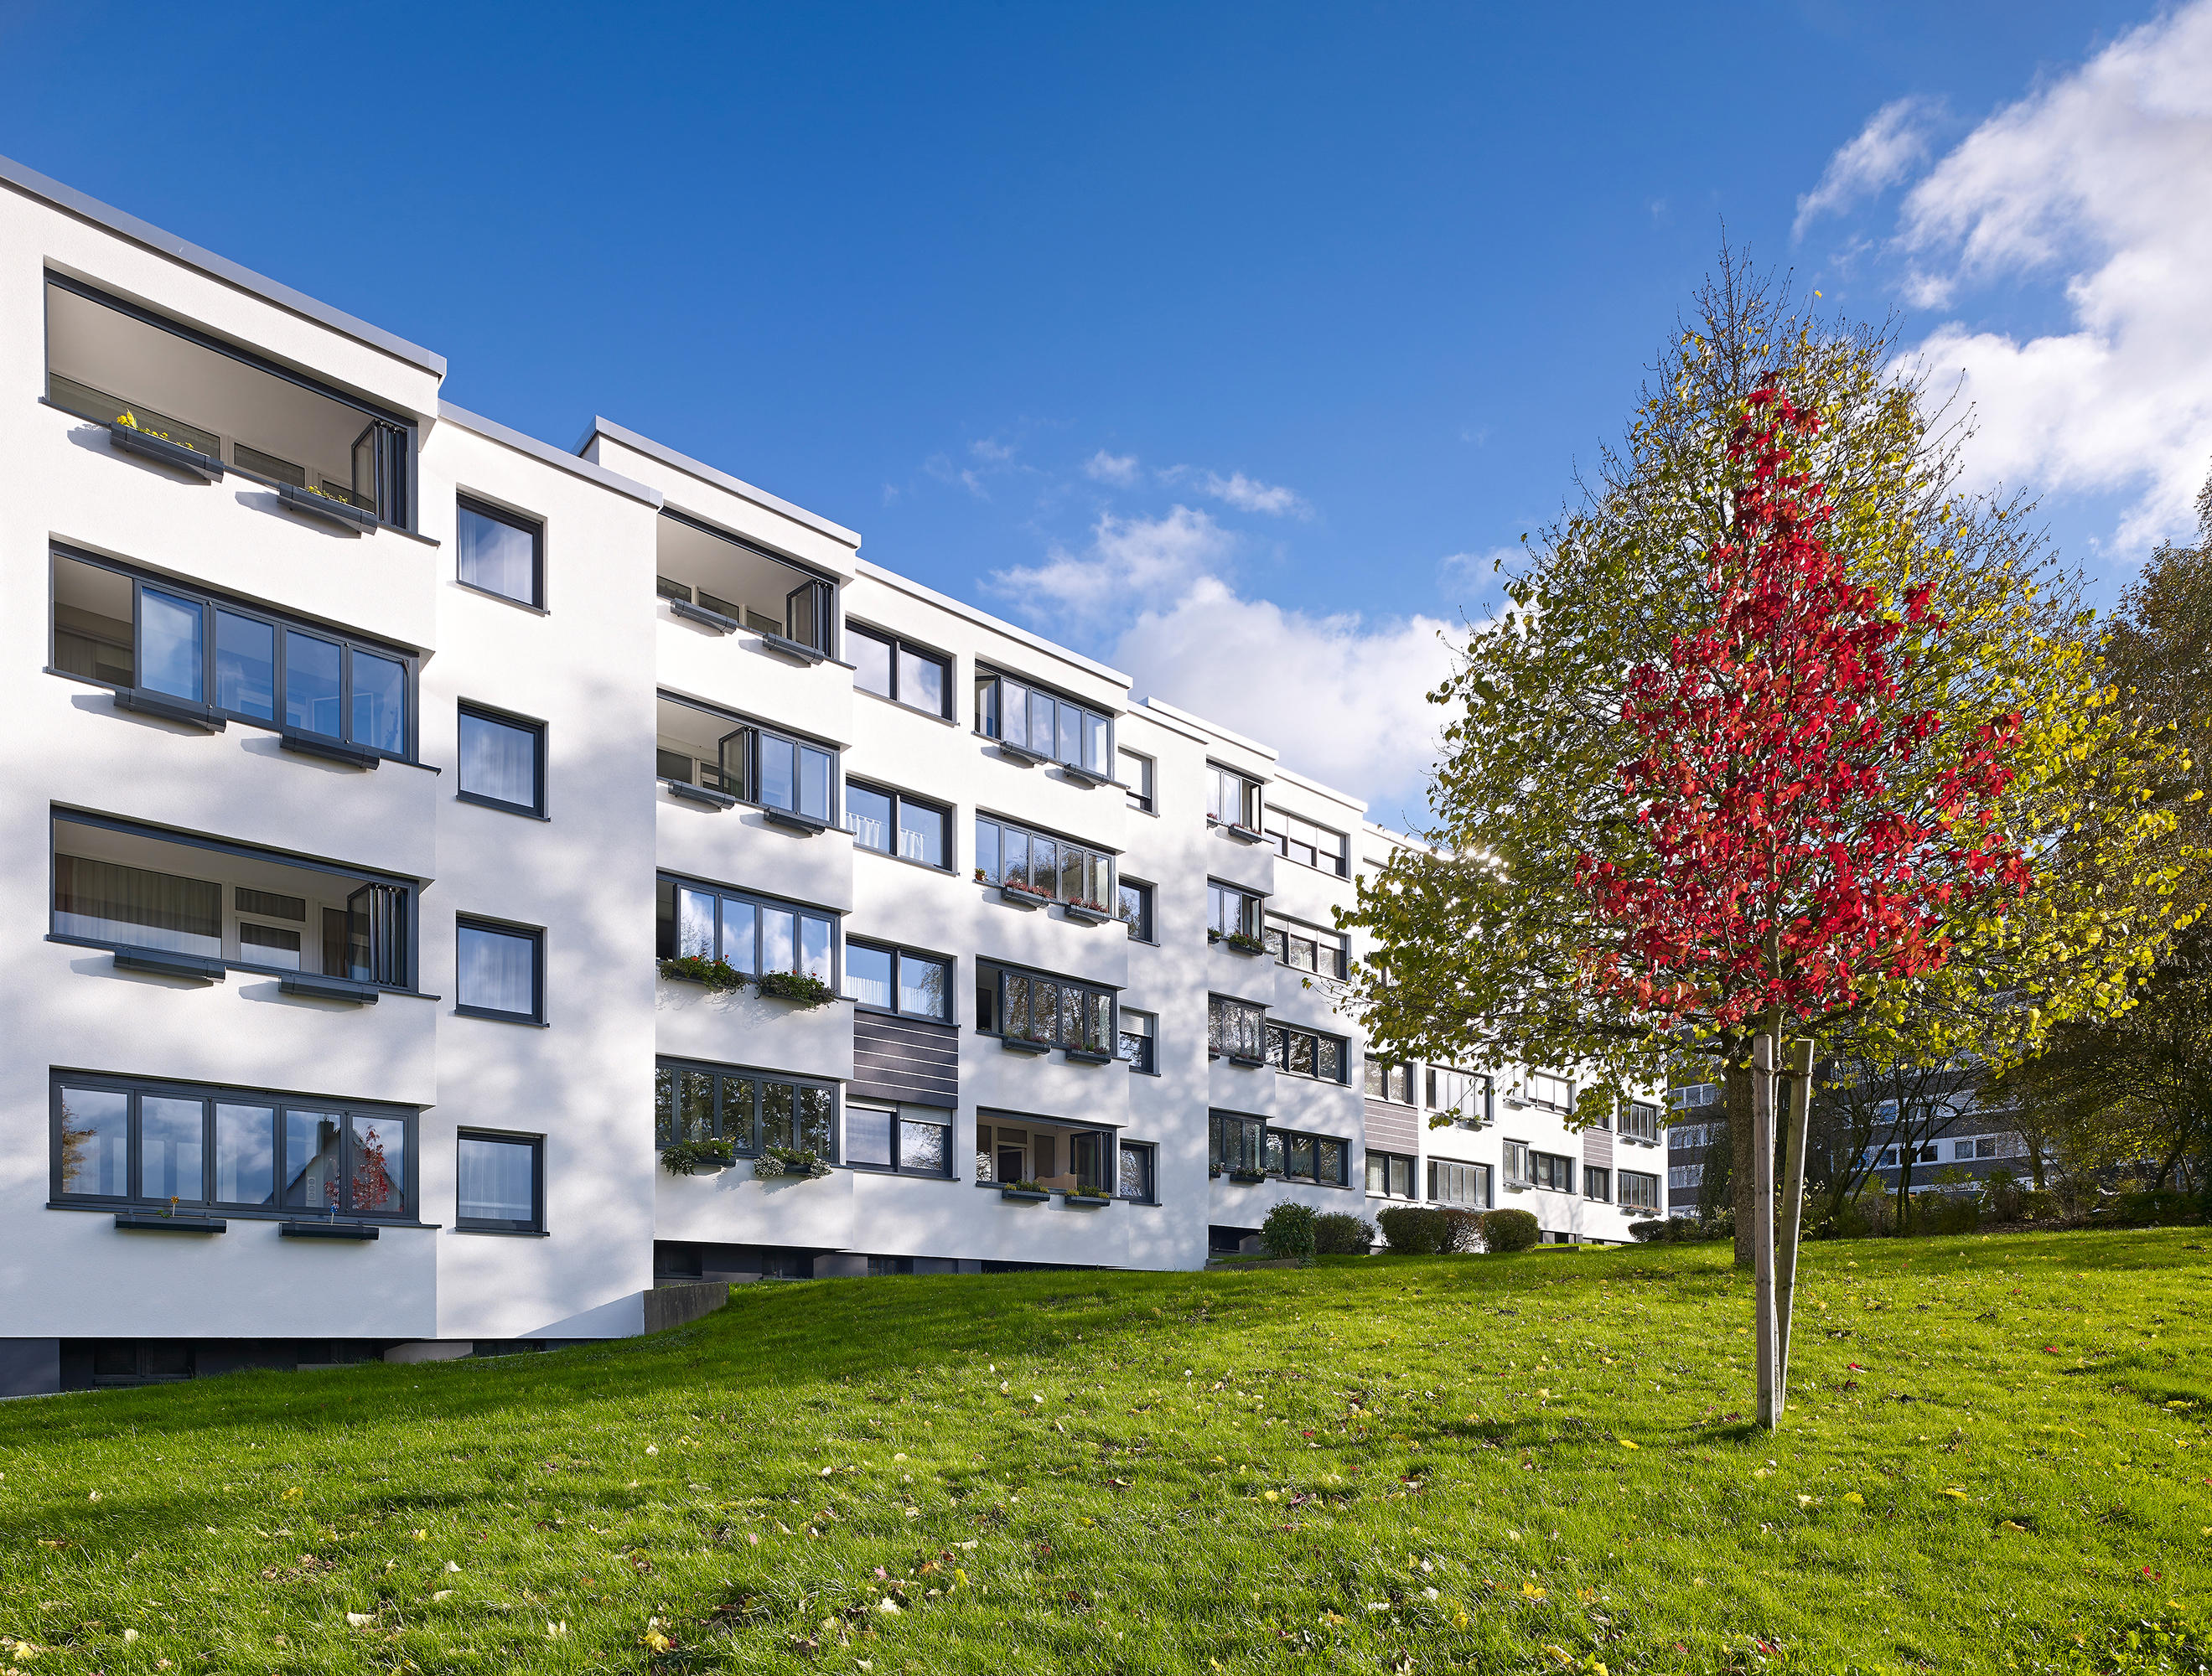 balkonverglasung sl modular w rmeged mmt balkonverglasung von solarlux architonic. Black Bedroom Furniture Sets. Home Design Ideas